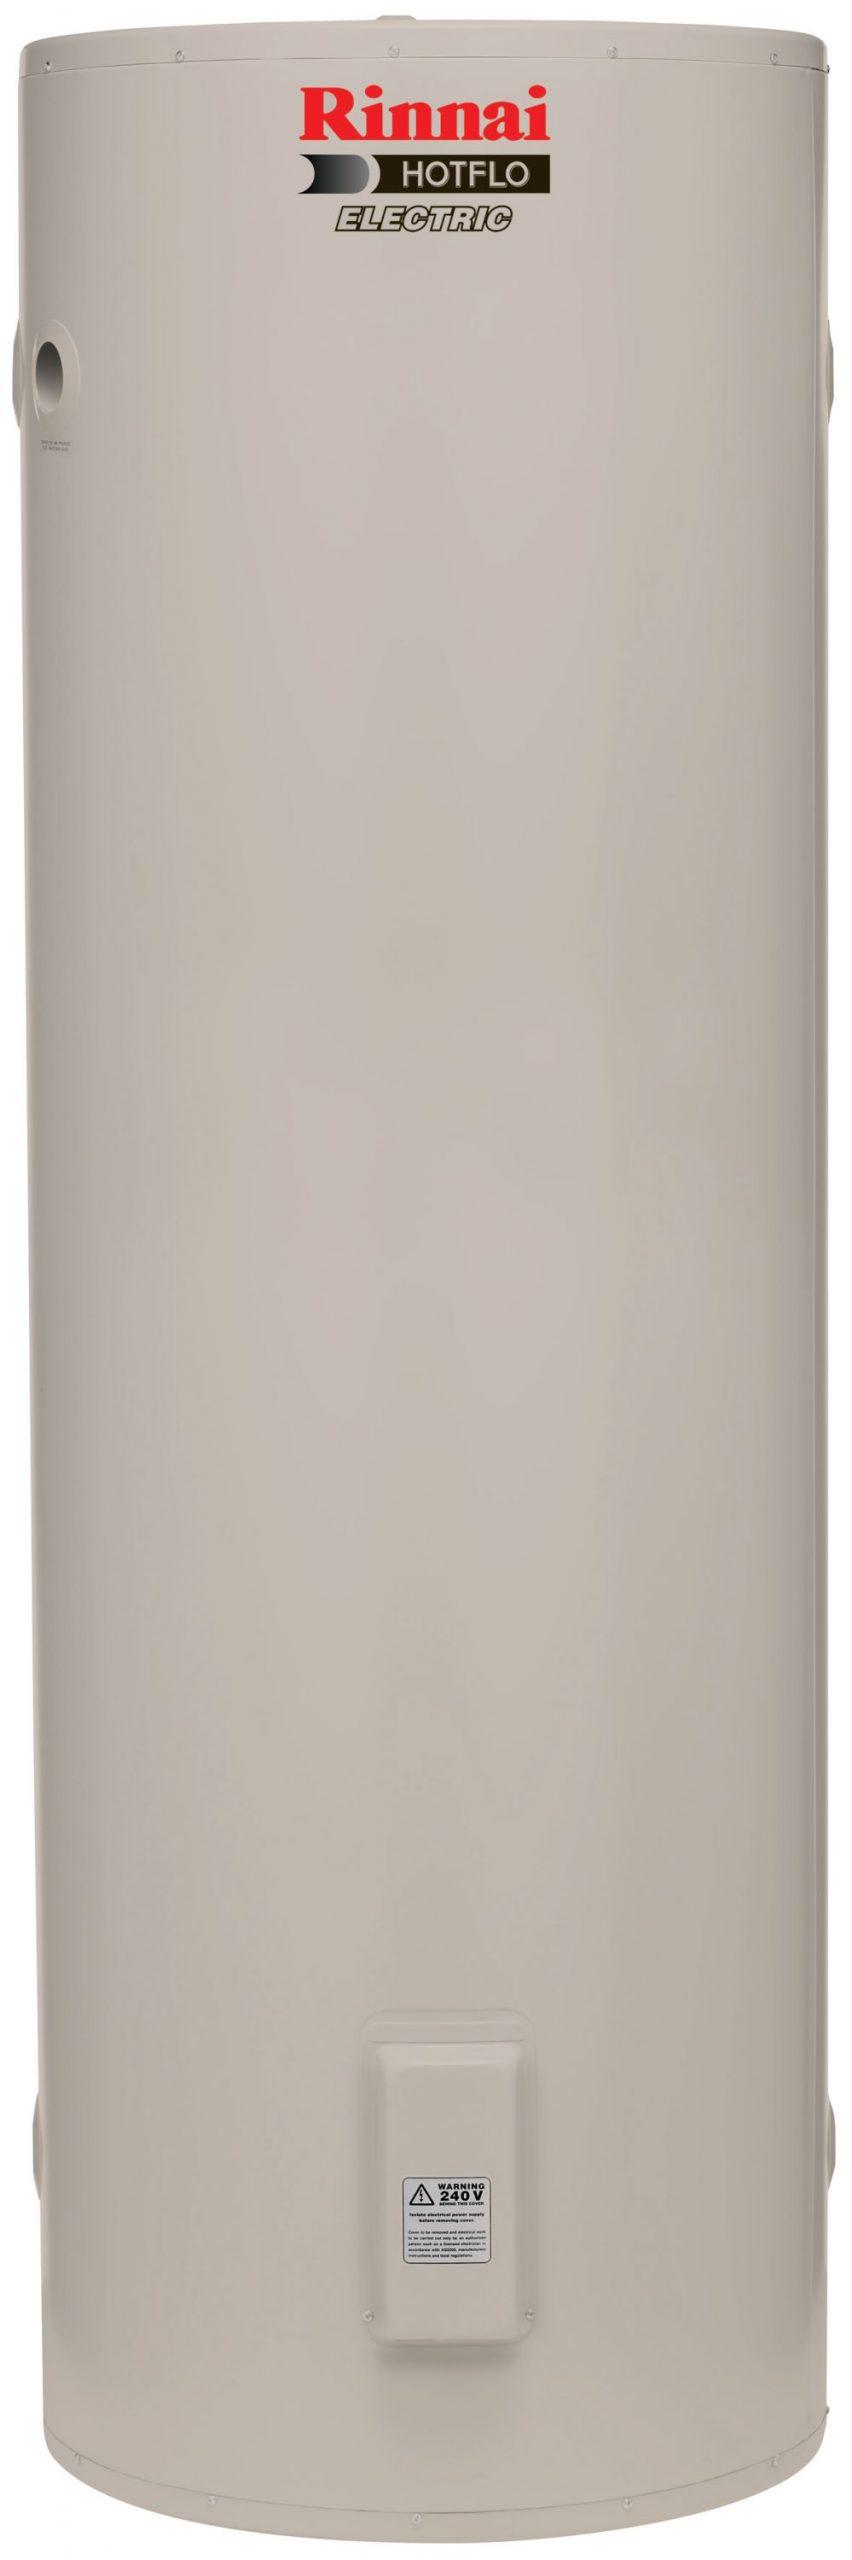 Hotflo Electric Hot Water Storage 400L